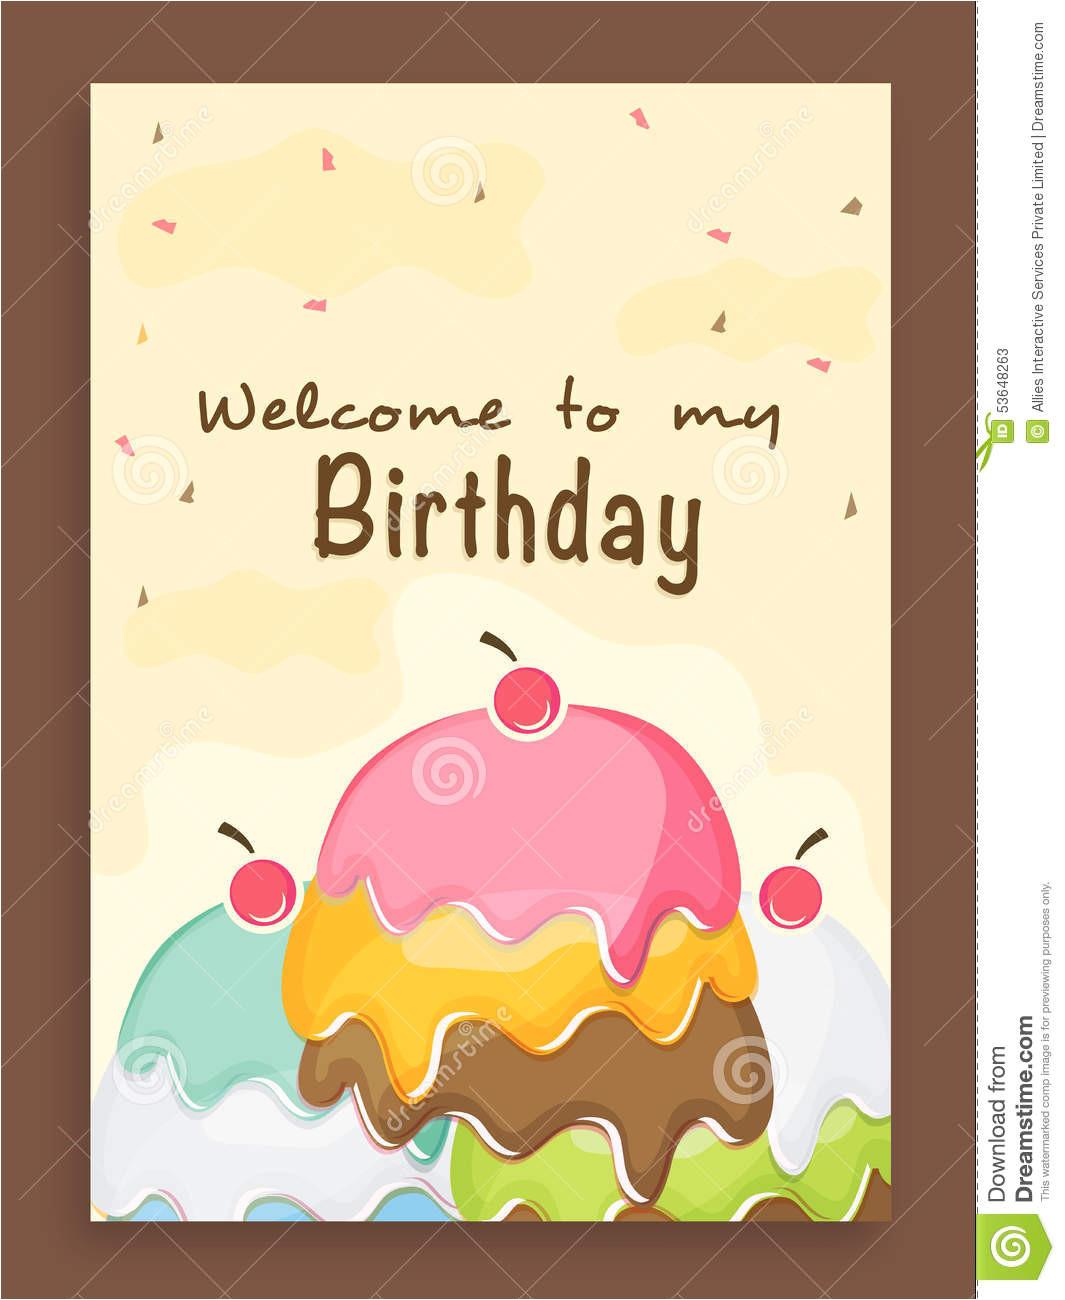 stock photo invitation card design birthday party beautiful vintage celebration decorated colorful cake image53648263